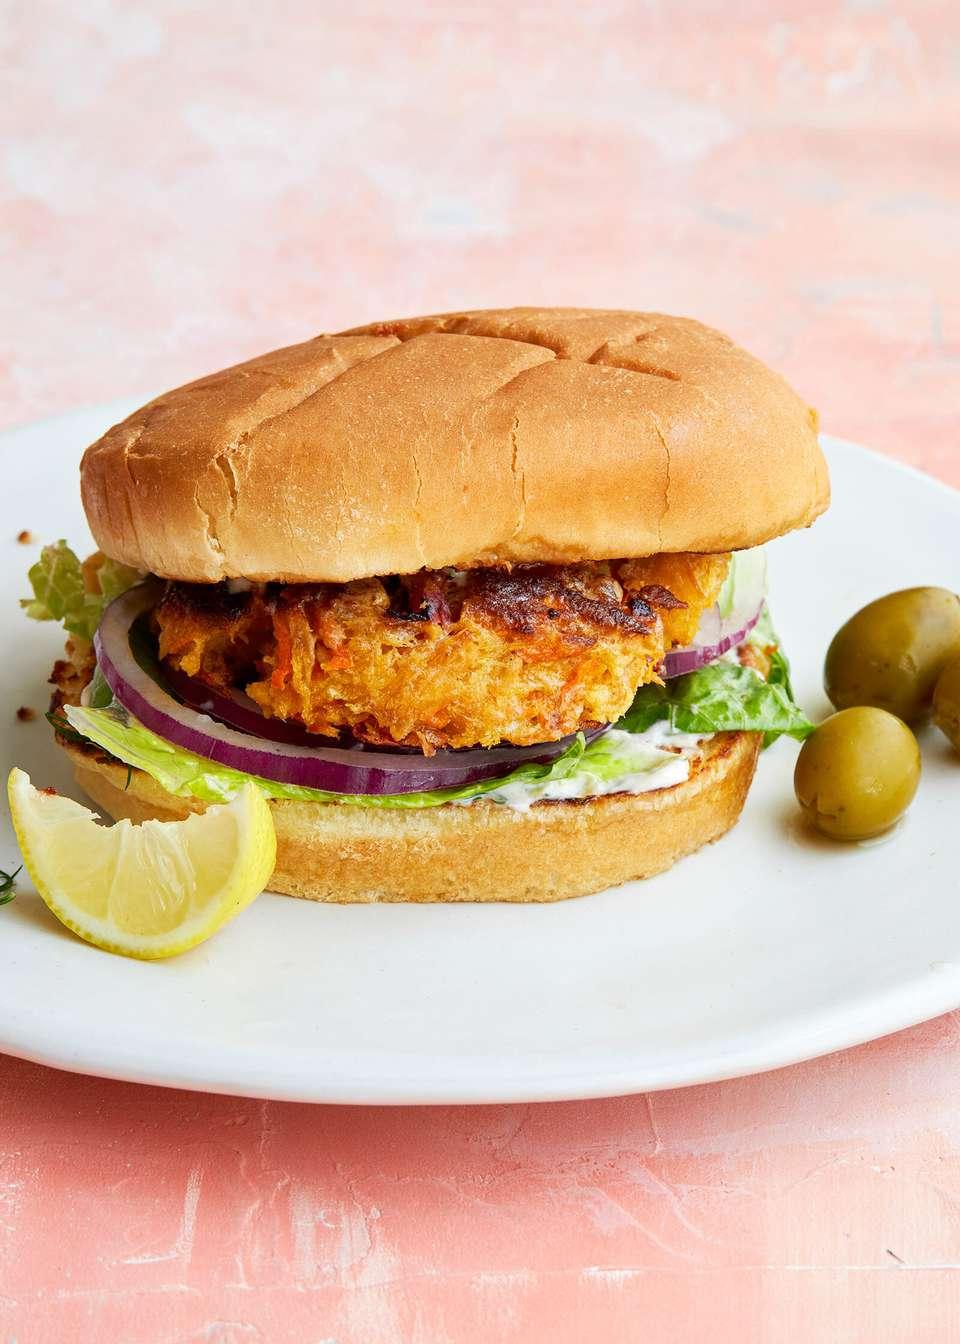 How to Make Tuna Burgers